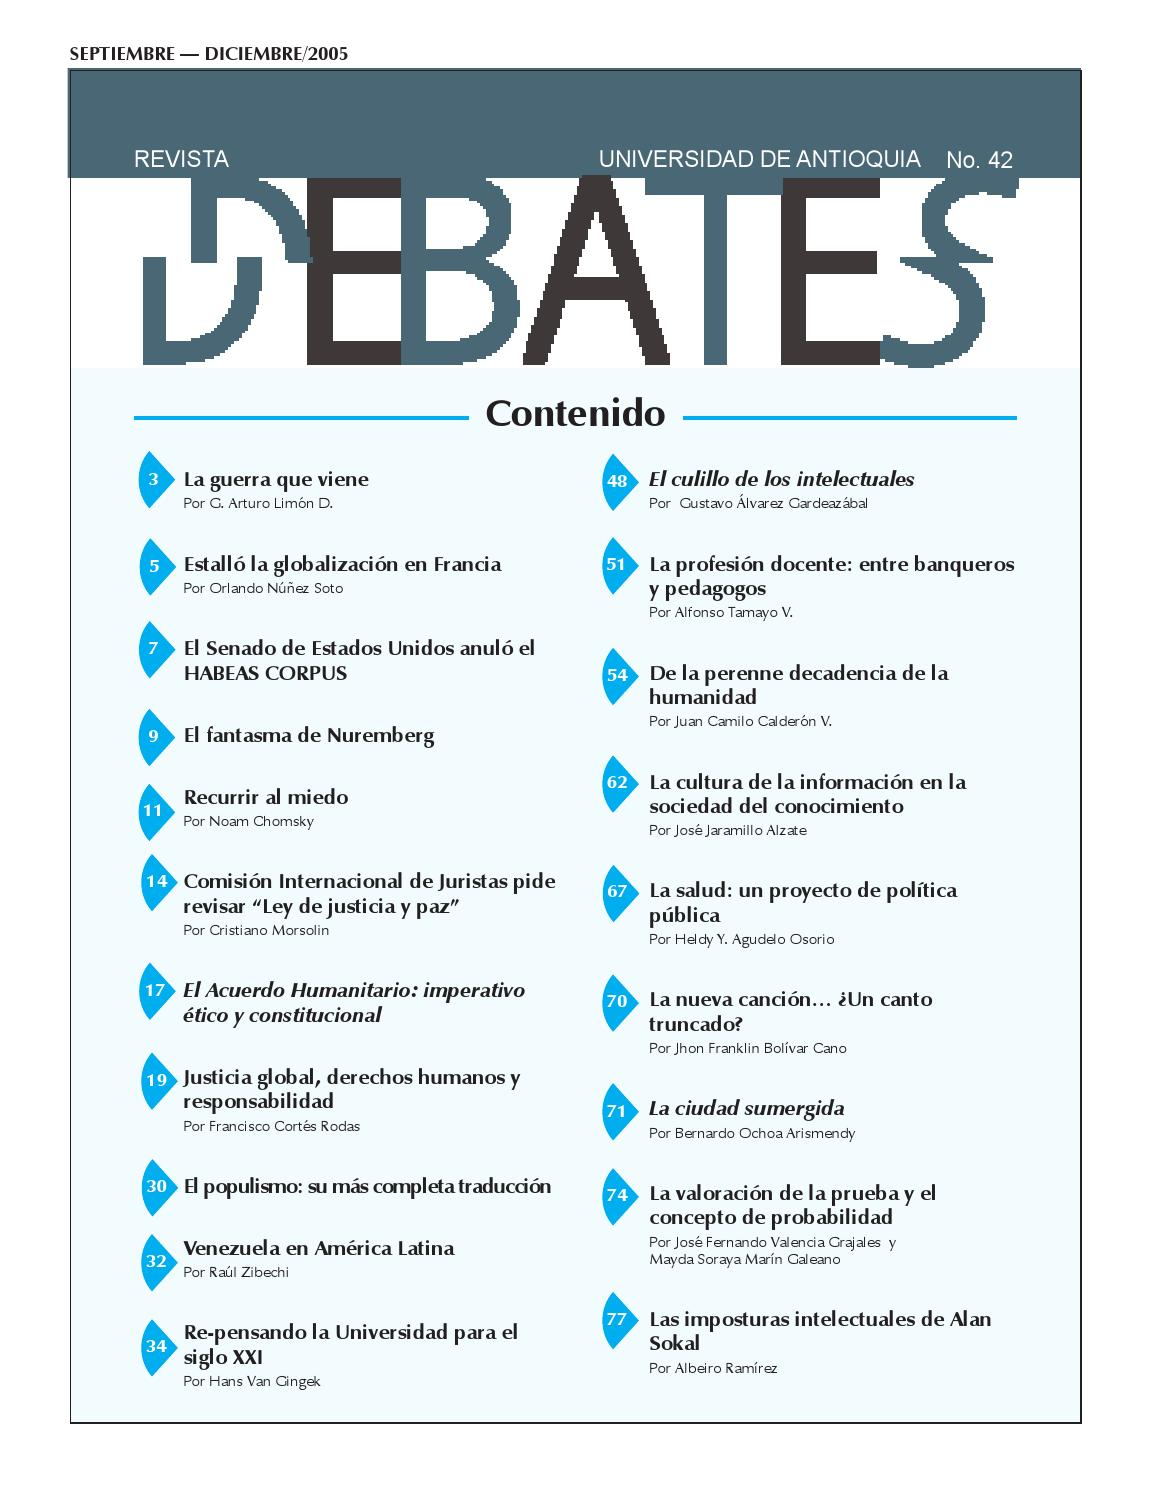 REVISTA DEBATES N° 42 by Universidad de Antioquia - issuu